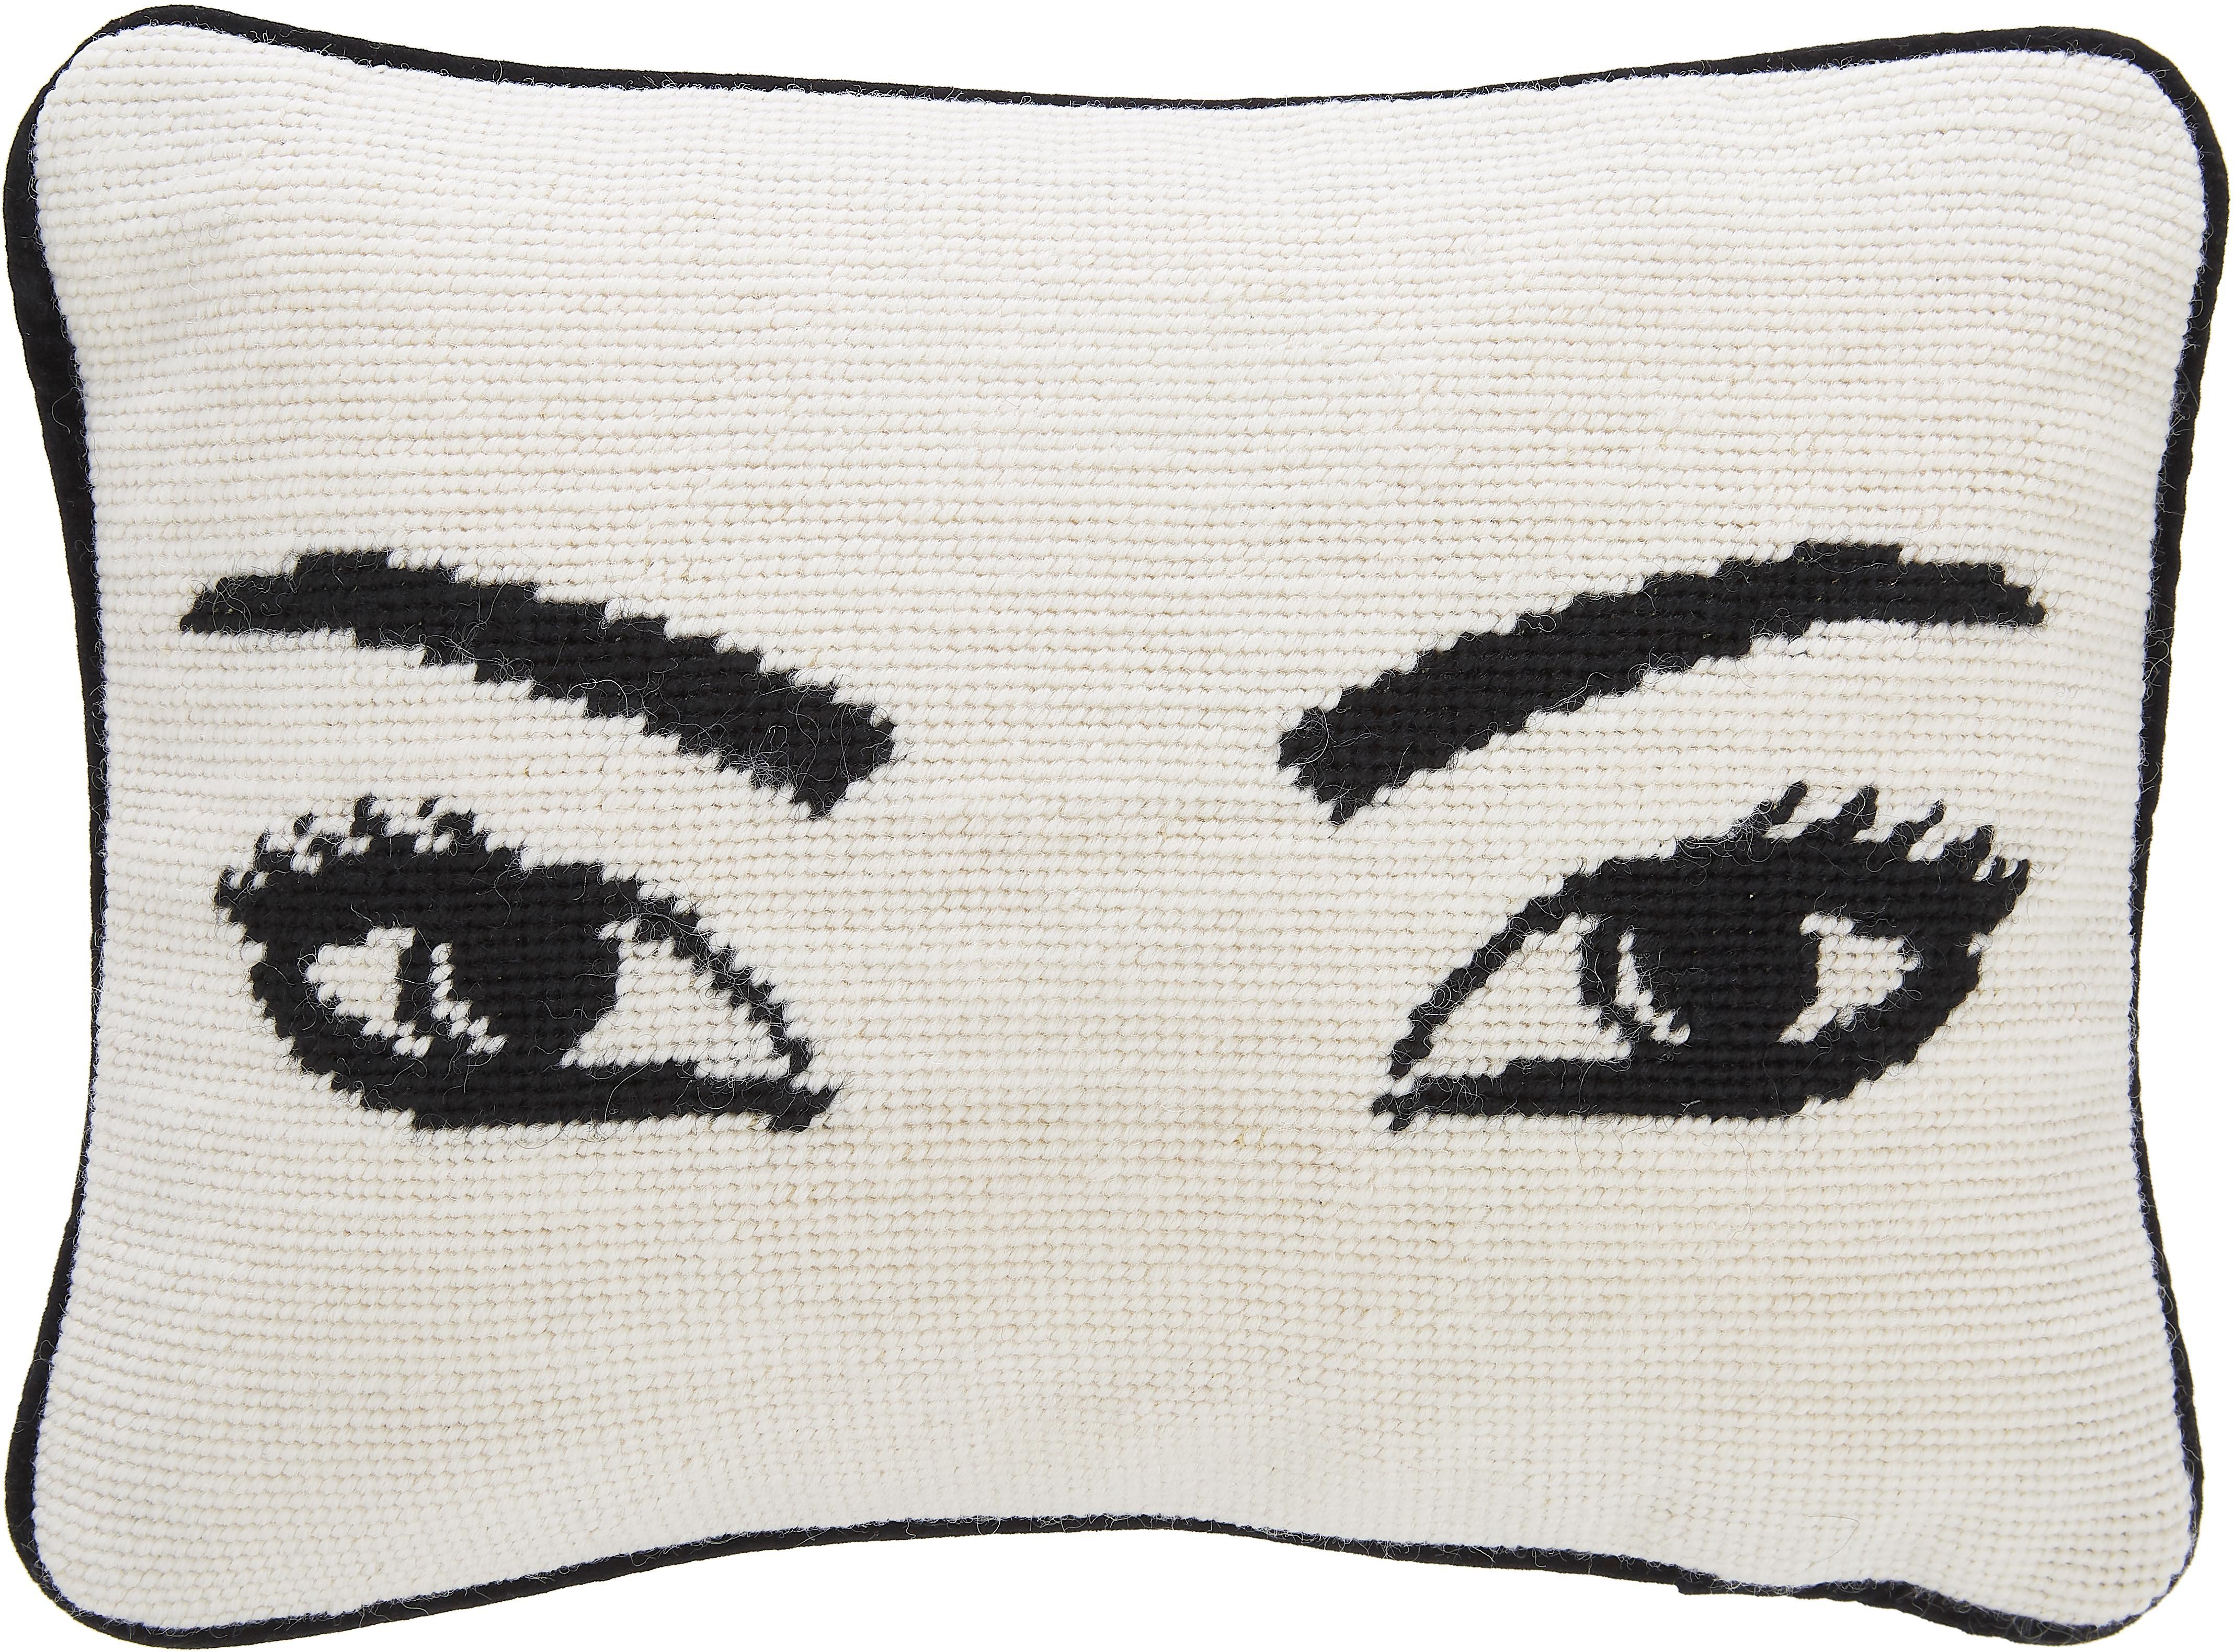 Cojín pequeño de diseño bordado a mano Eyes, con relleno, Parte delantera: lana, Parte trasera: terciopelo de algodón, Blanco, negro, An 23 x L 30 cm